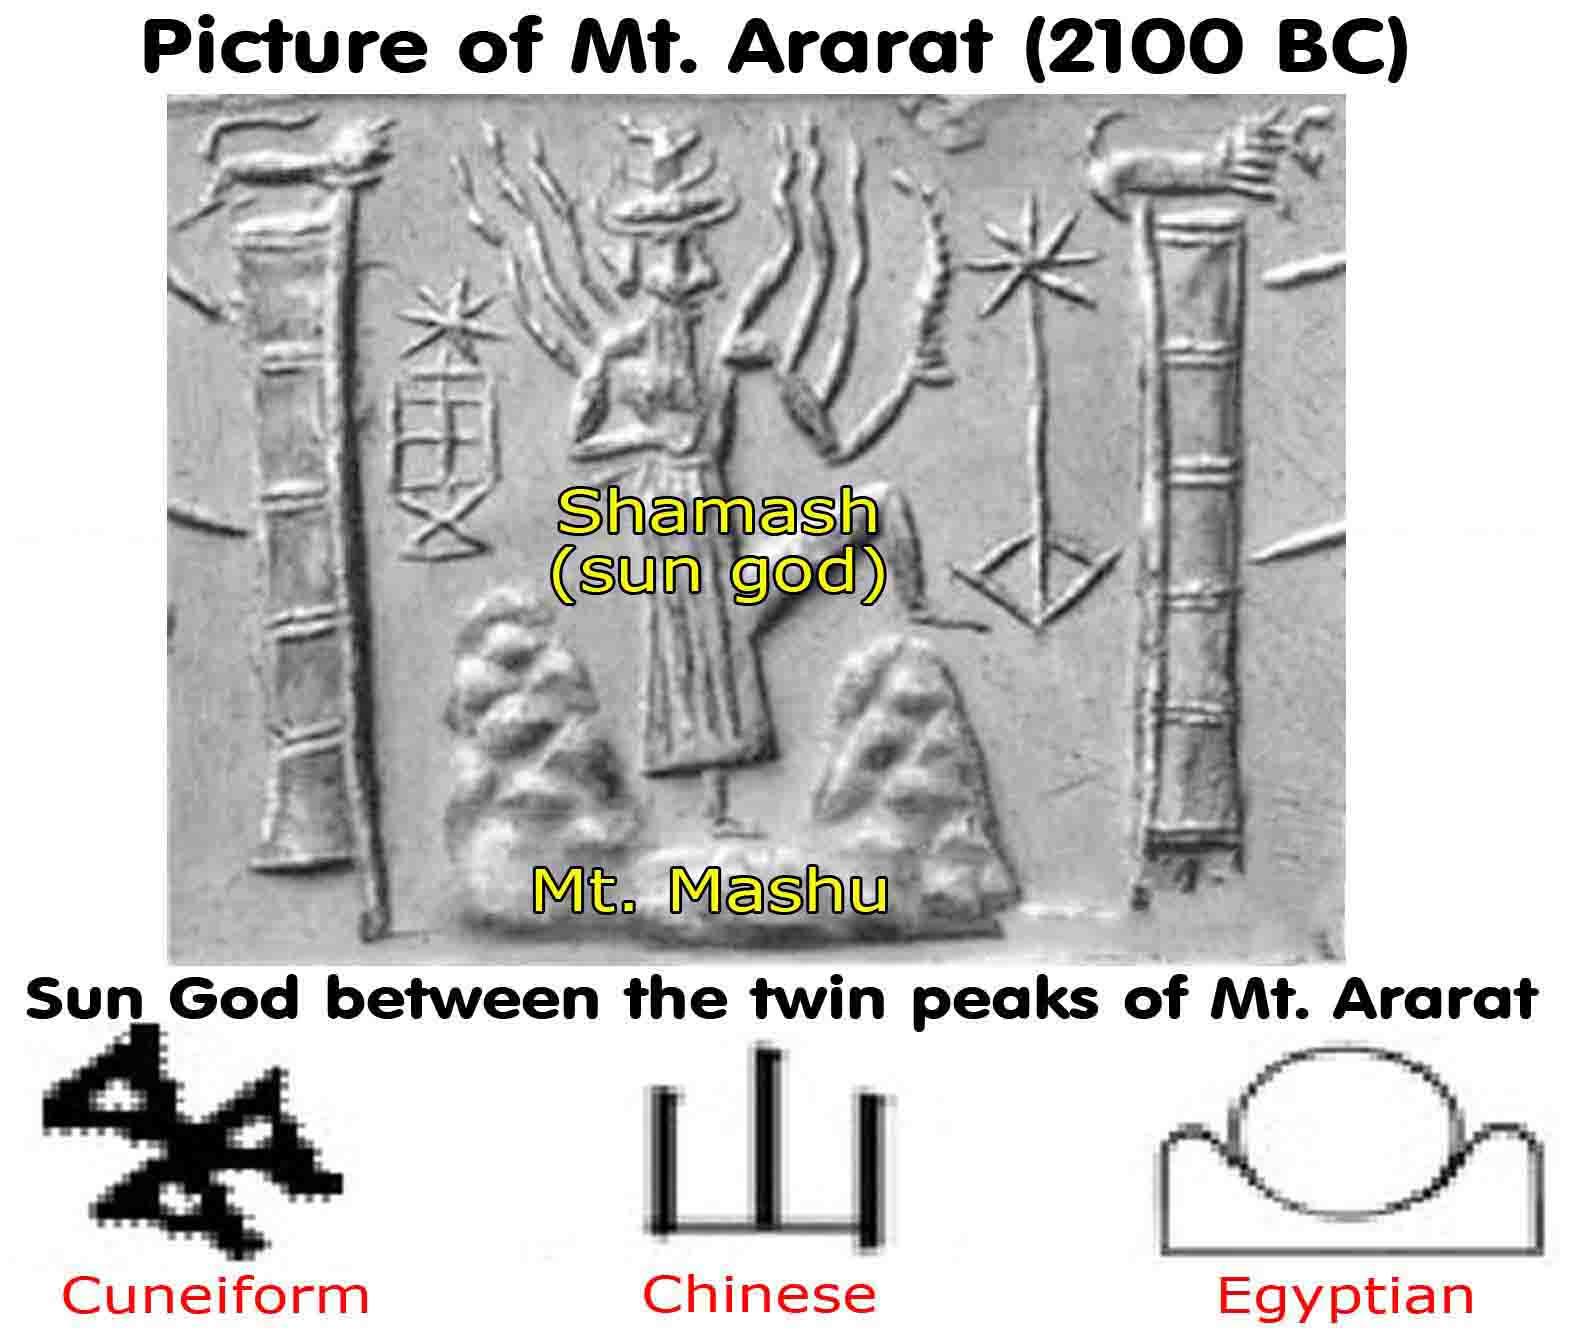 Noah's Ark at Mount Ararat twin peaks sumerian sun god Shamash between twin peaks of Mashu